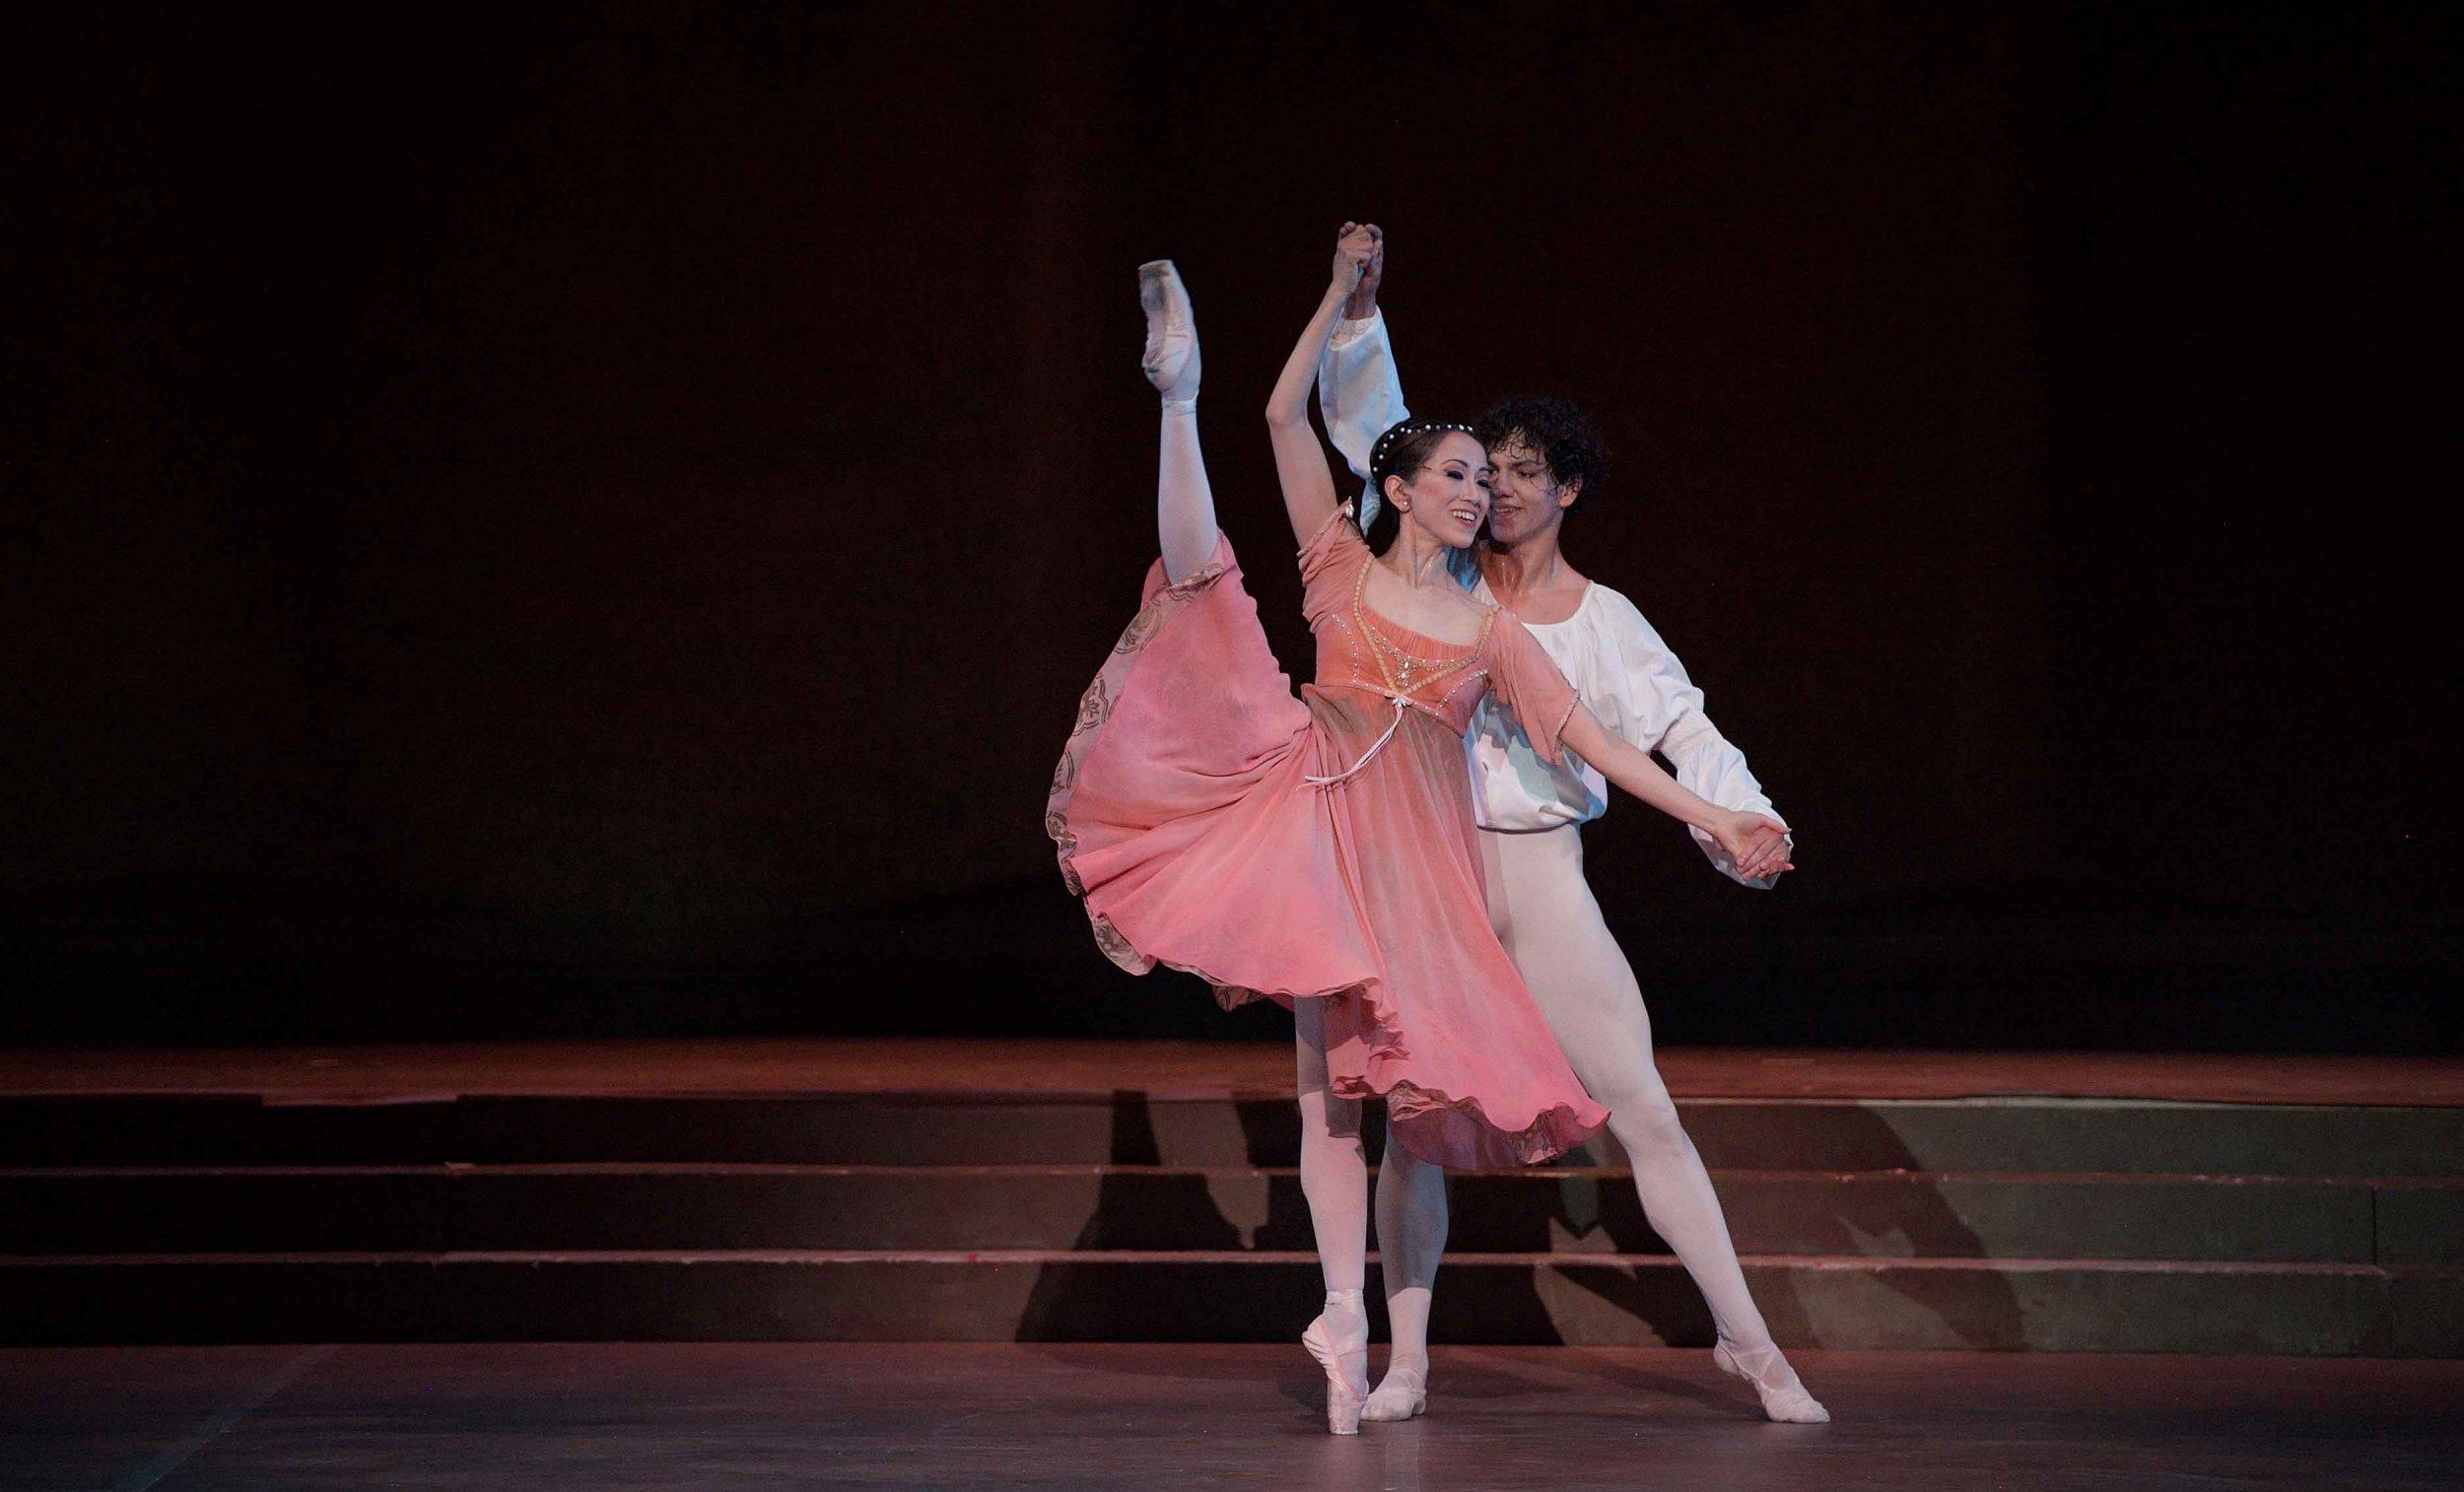 Erina-Takahashi-as-Juliet-and-Isaac-Hernandez-as-Romeo-in-Romeo-&-Juliet-©-Laurent-Liotardo-(3)